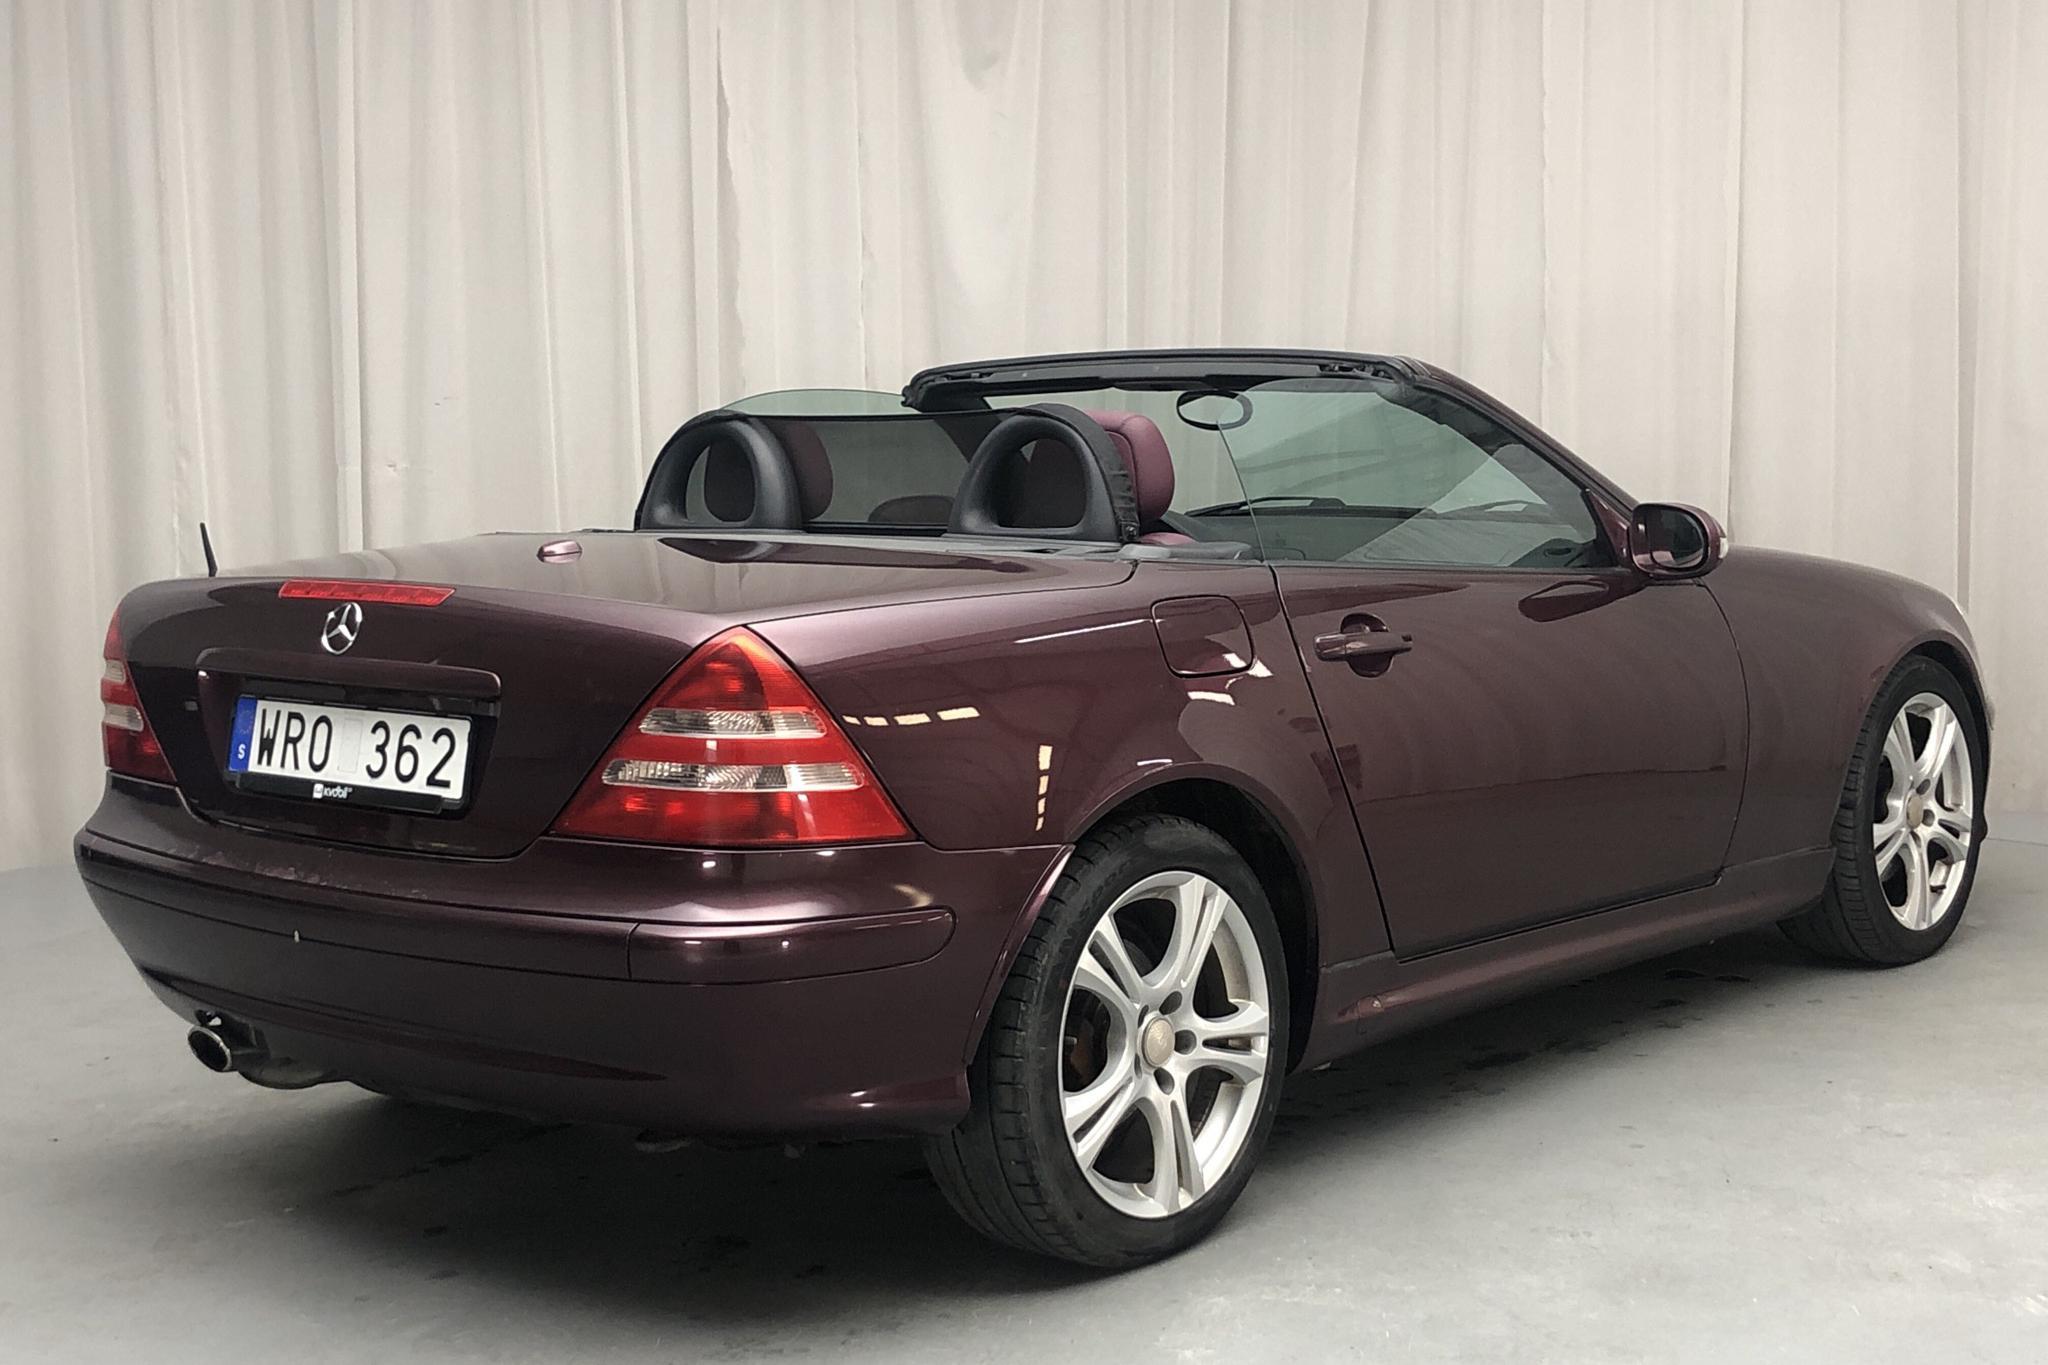 Mercedes SLK 320 R170 (218hk) - 12 161 mil - Manuell - röd - 2001